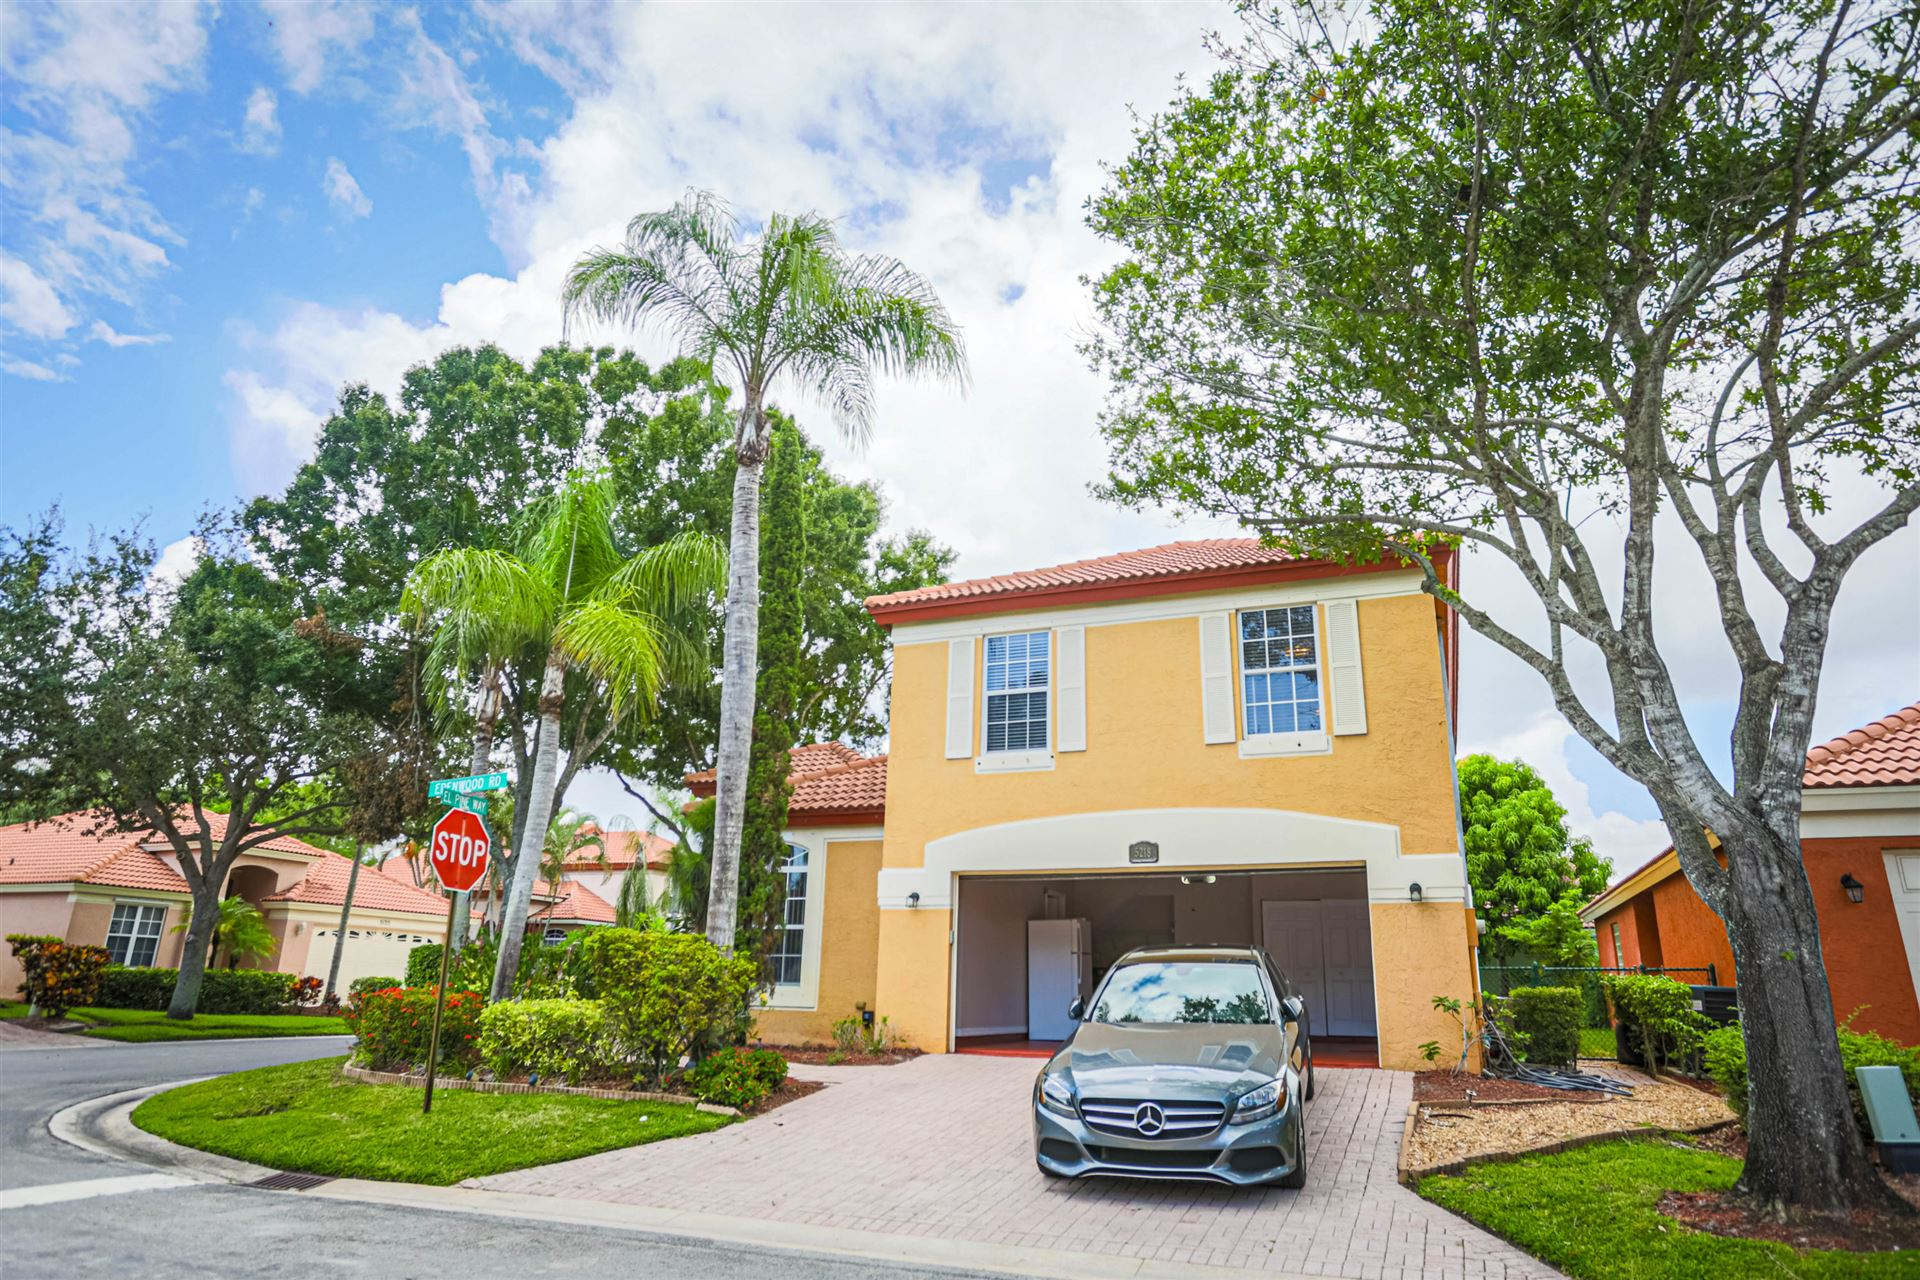 Photo of 5218 Edenwood Road, Riviera Beach, FL 33418 (MLS # RX-10647184)